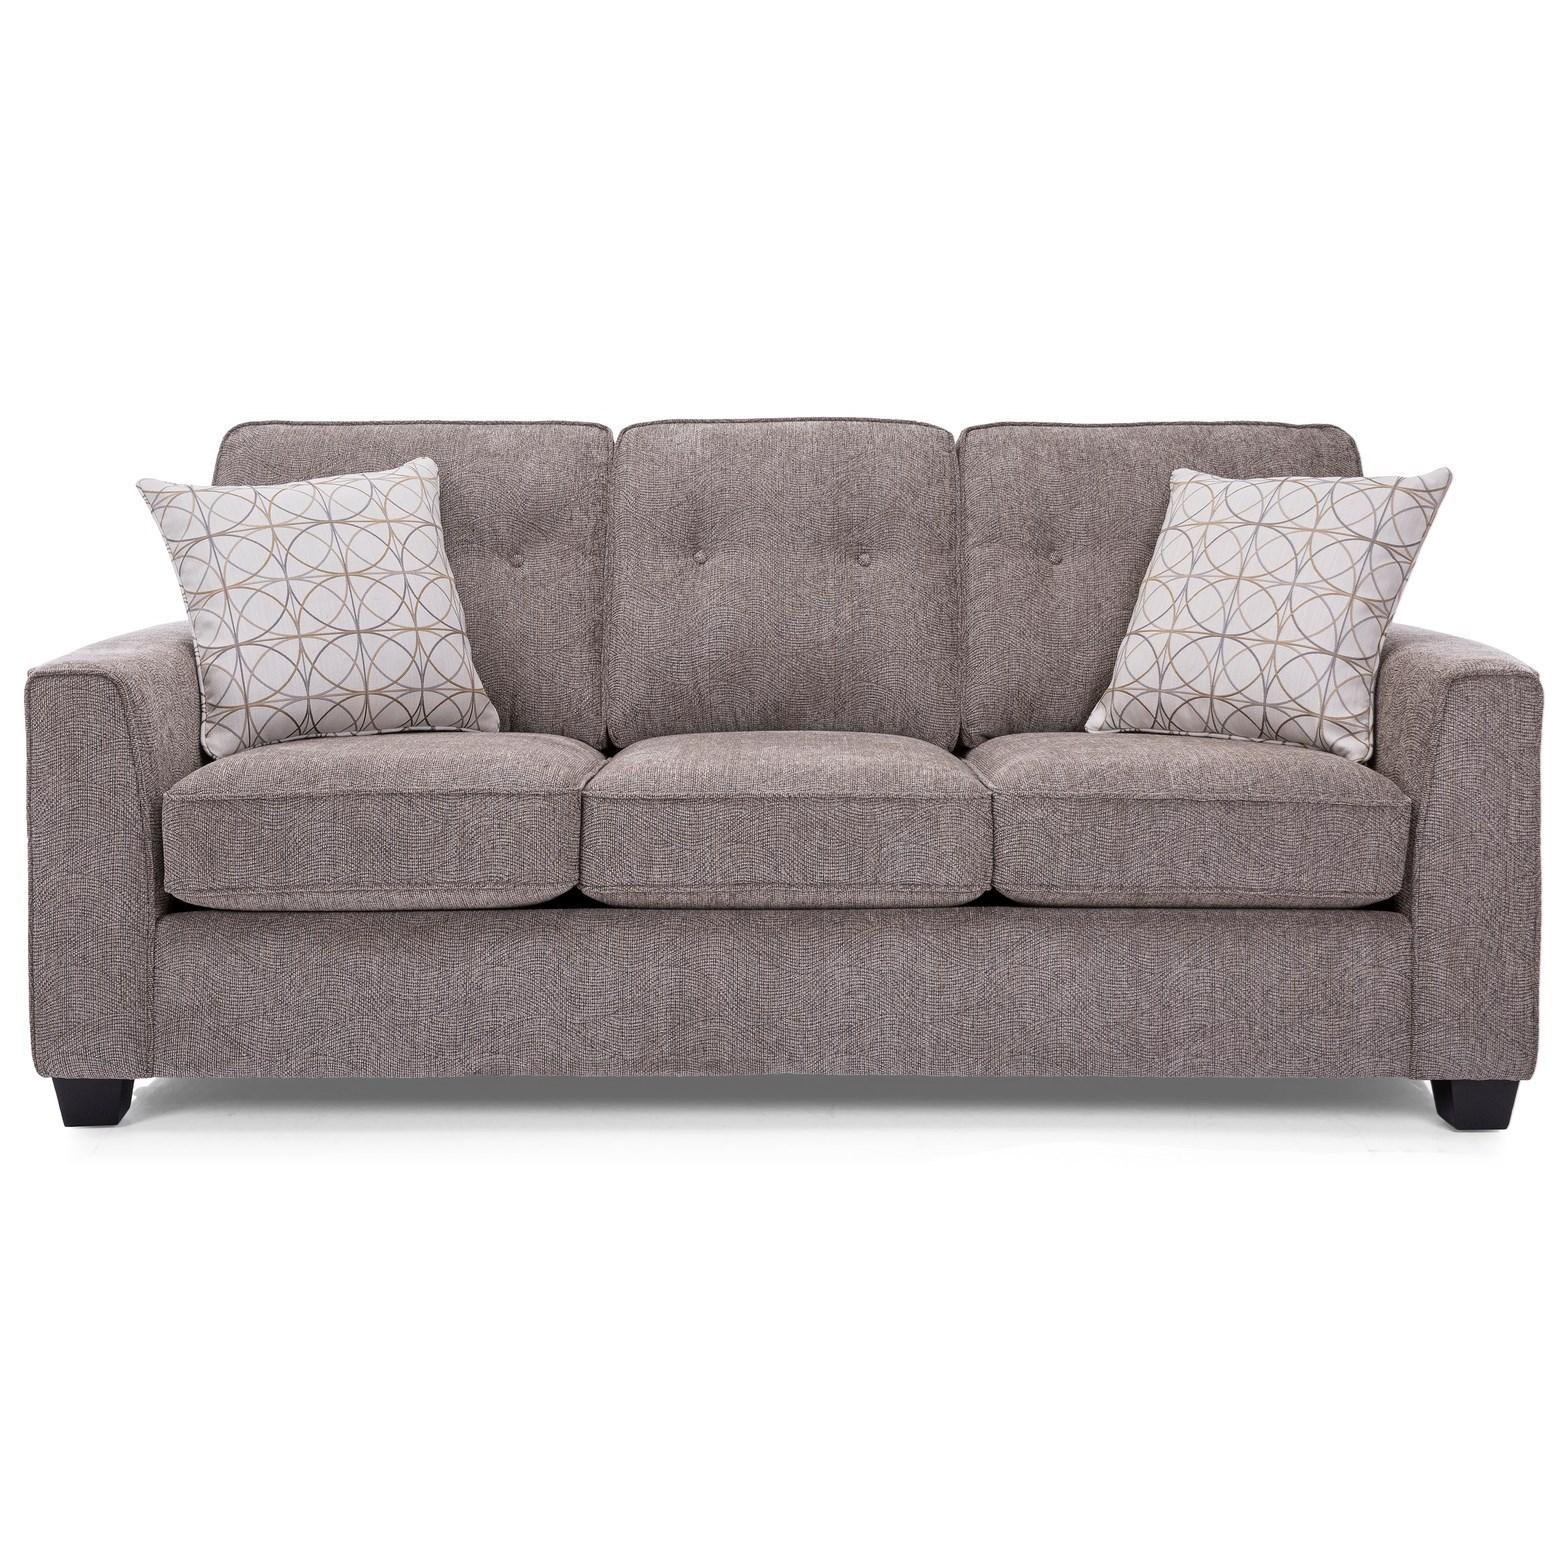 2967 Sofa by Decor-Rest at Johnny Janosik